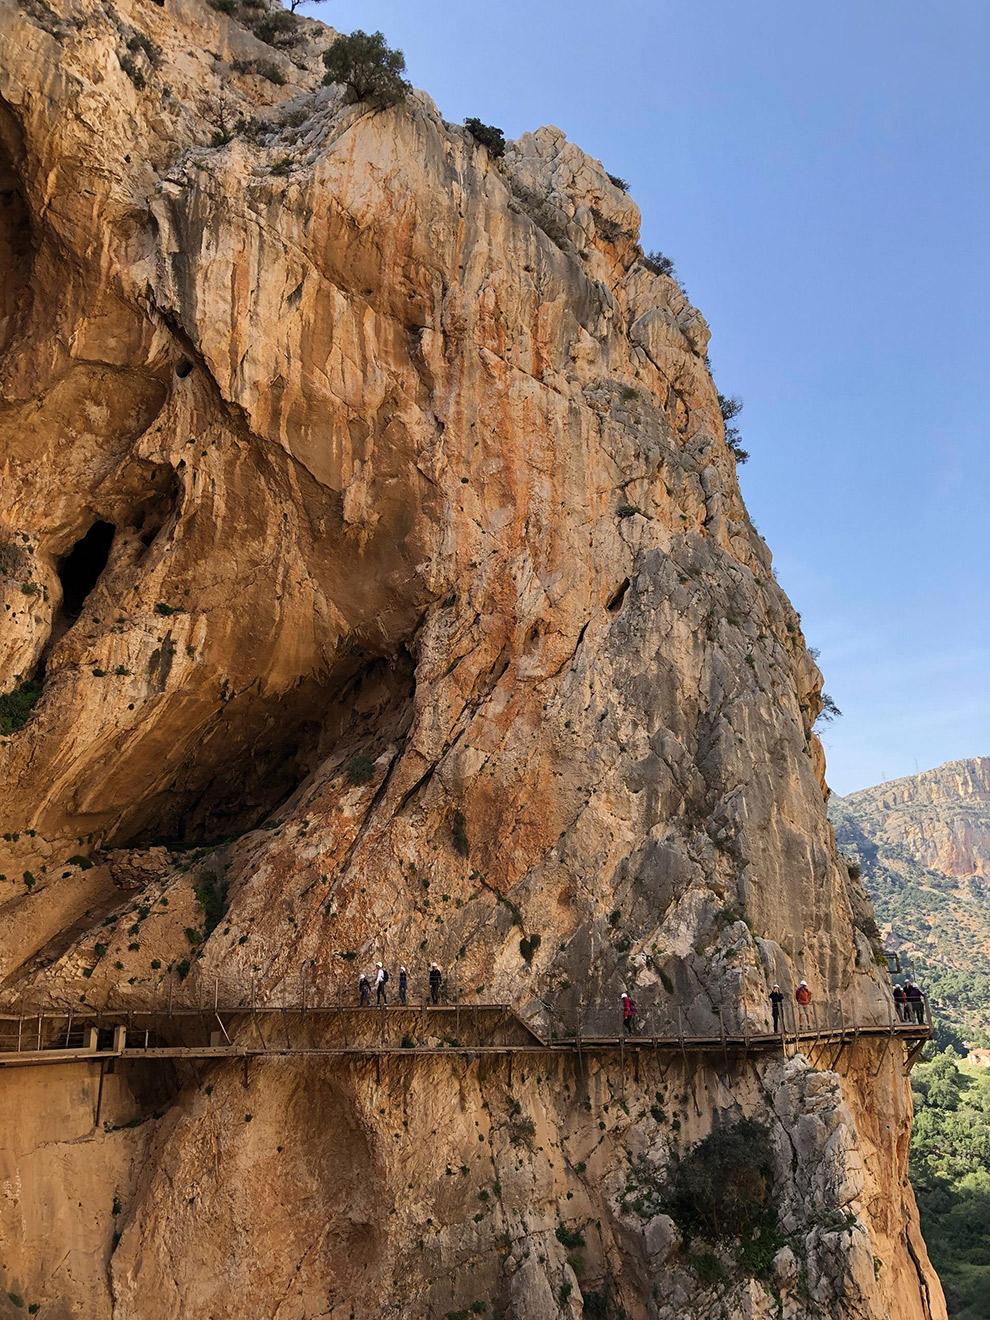 Wandelpad langs steile rots in Caminito del Rey